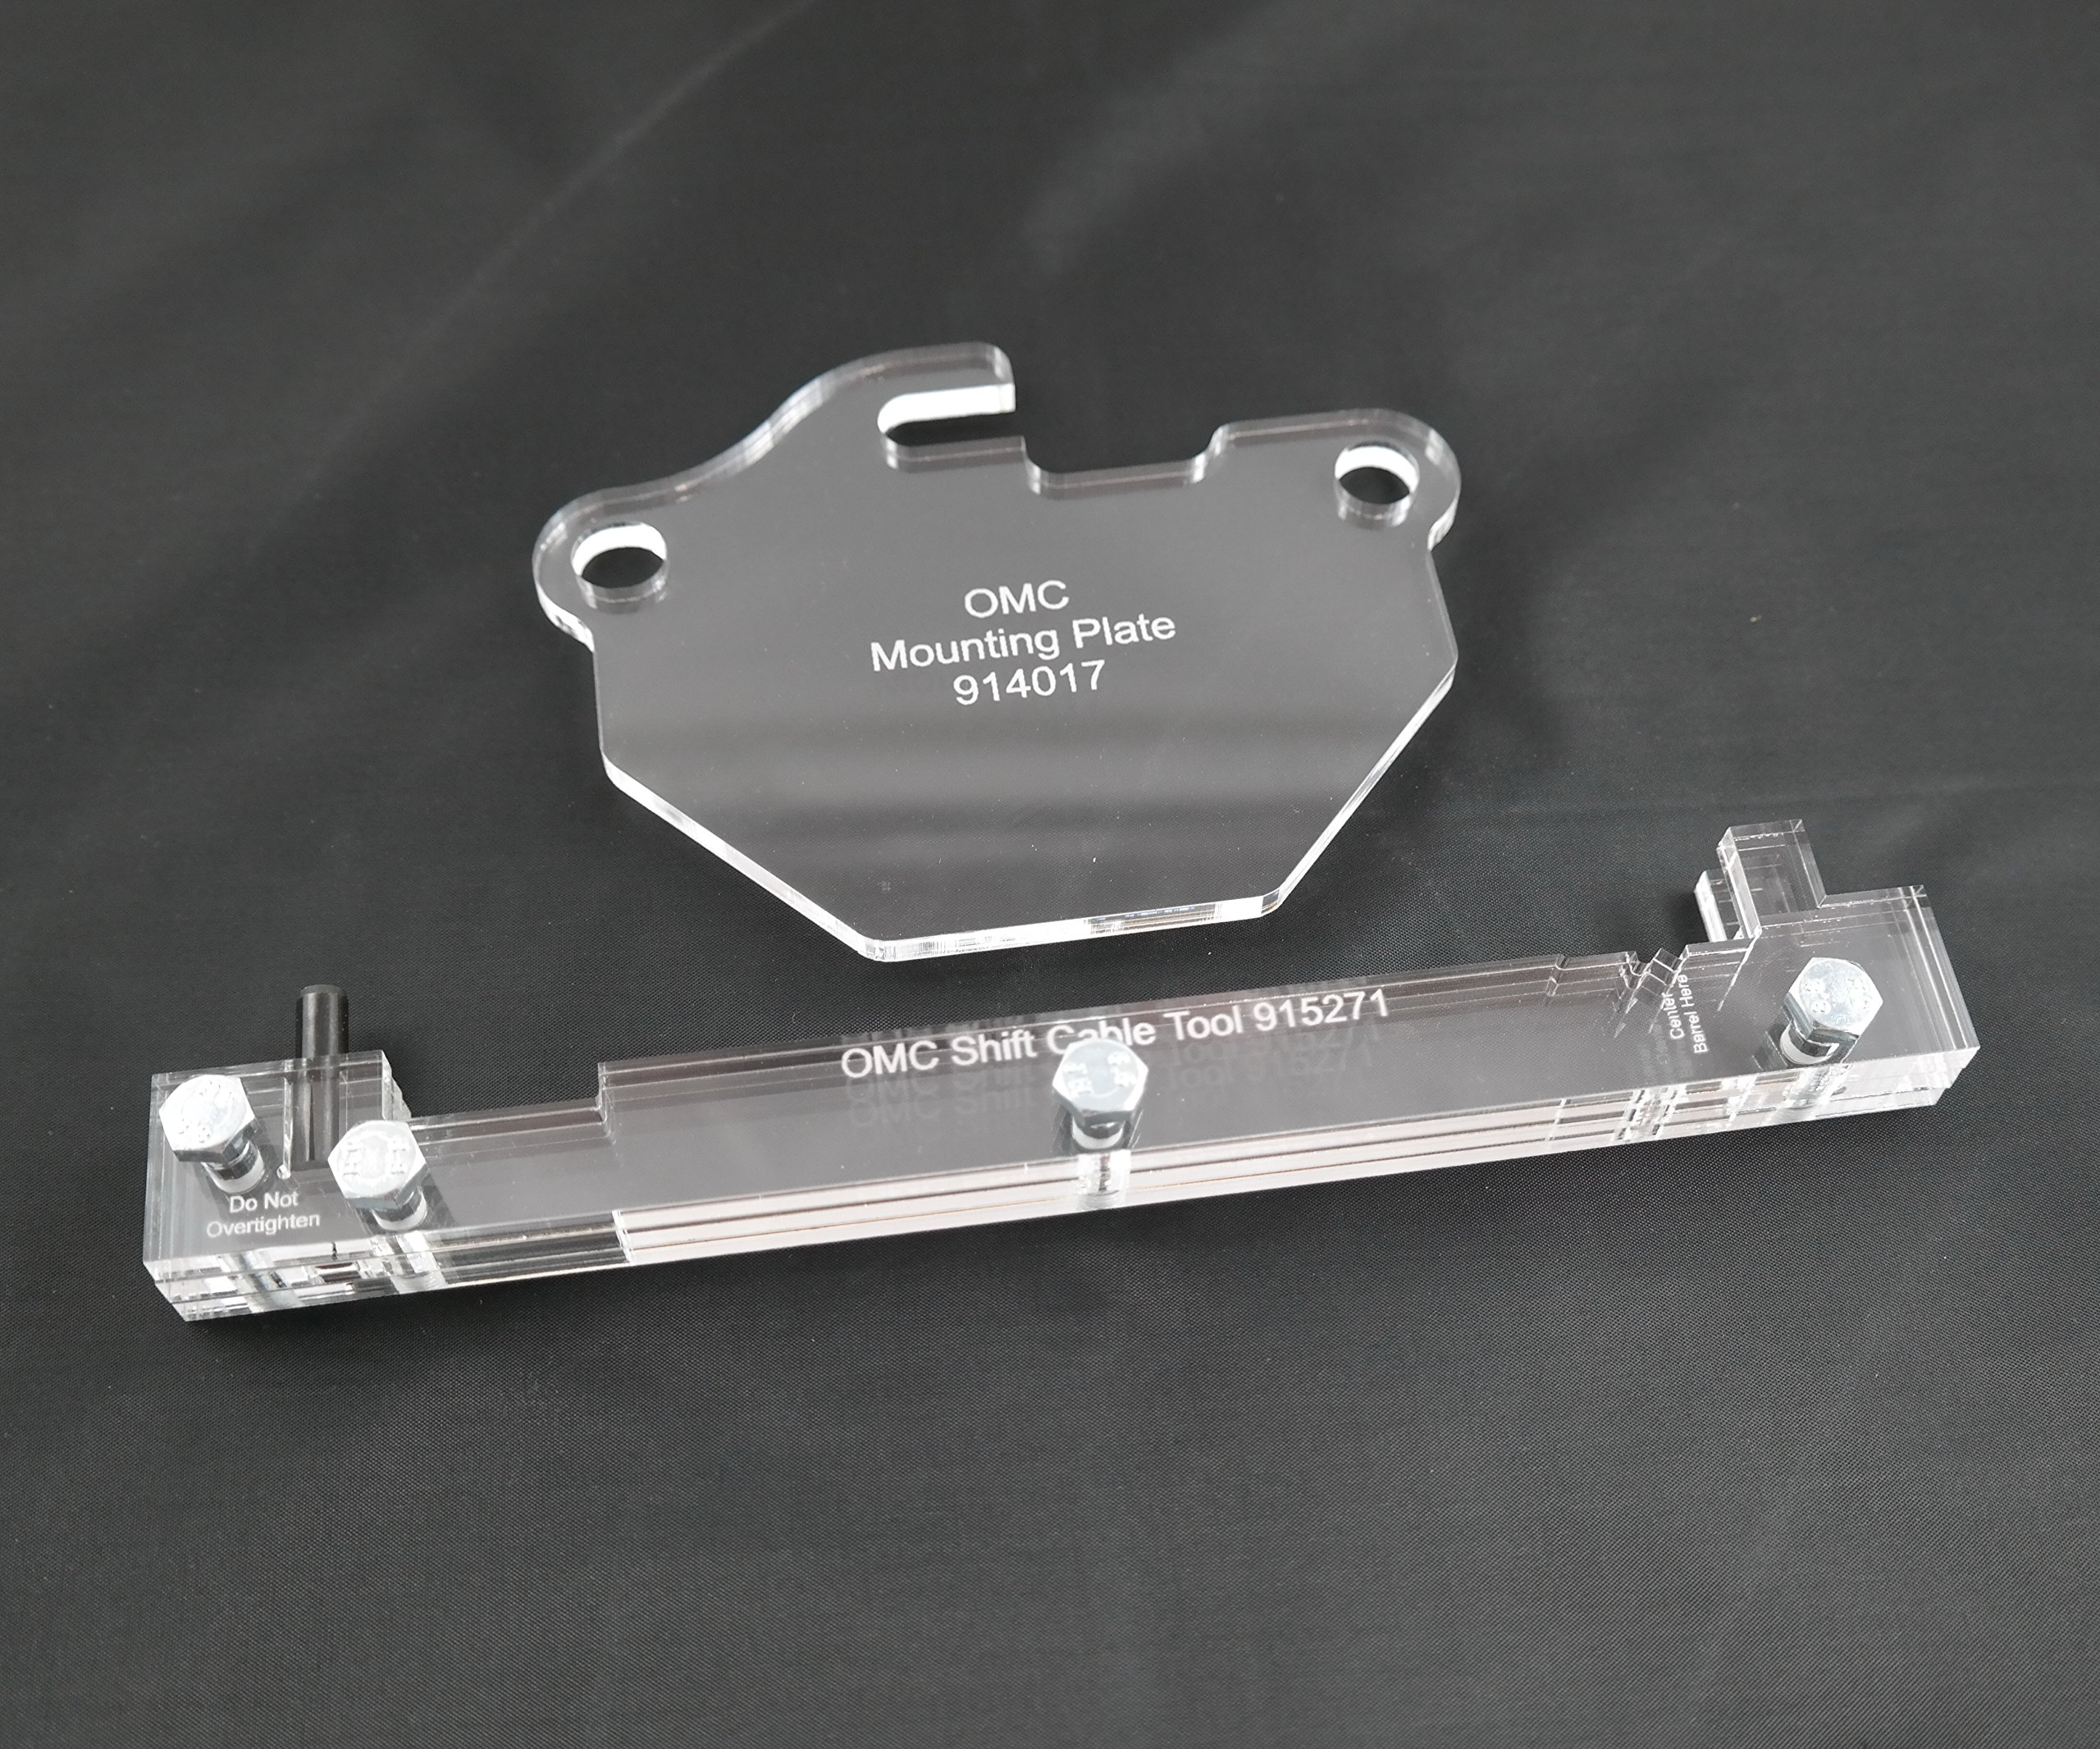 SpeedFreakCNC OMC Cobra Compatible Sterndrive Shift Cable & Bell Crank Alignment Tools 915271 & 914017